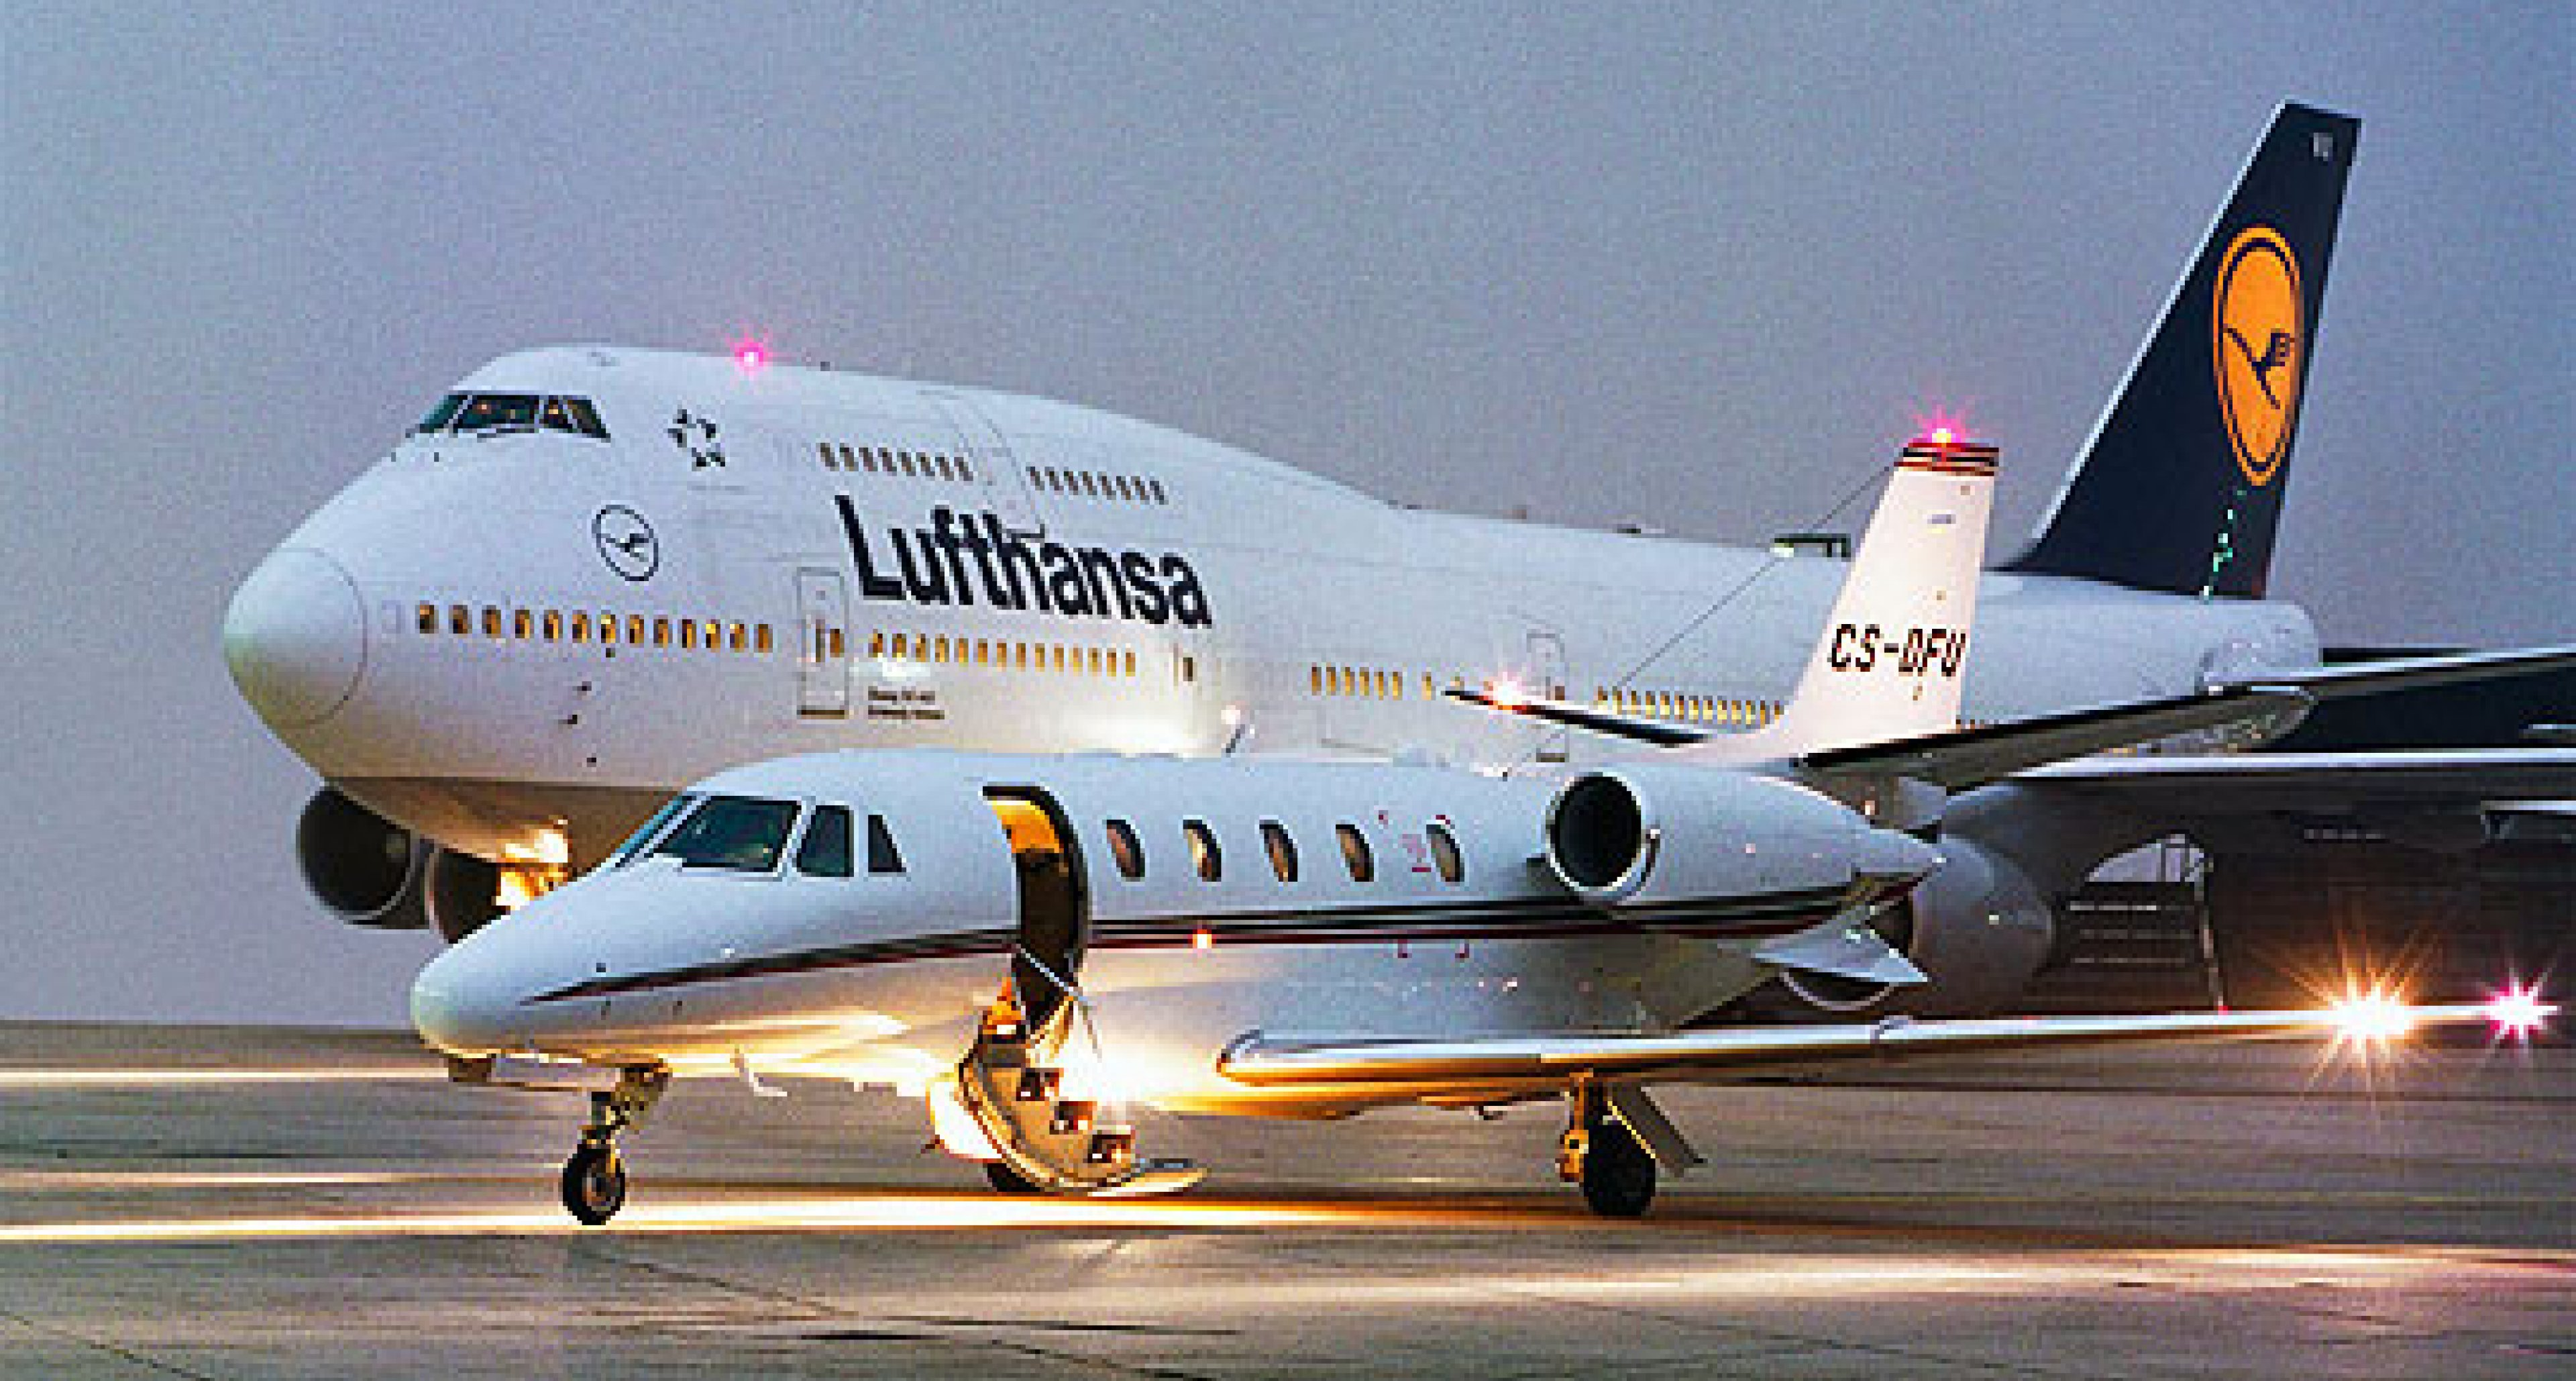 Lufthansa Private Jet: Flights on Demand